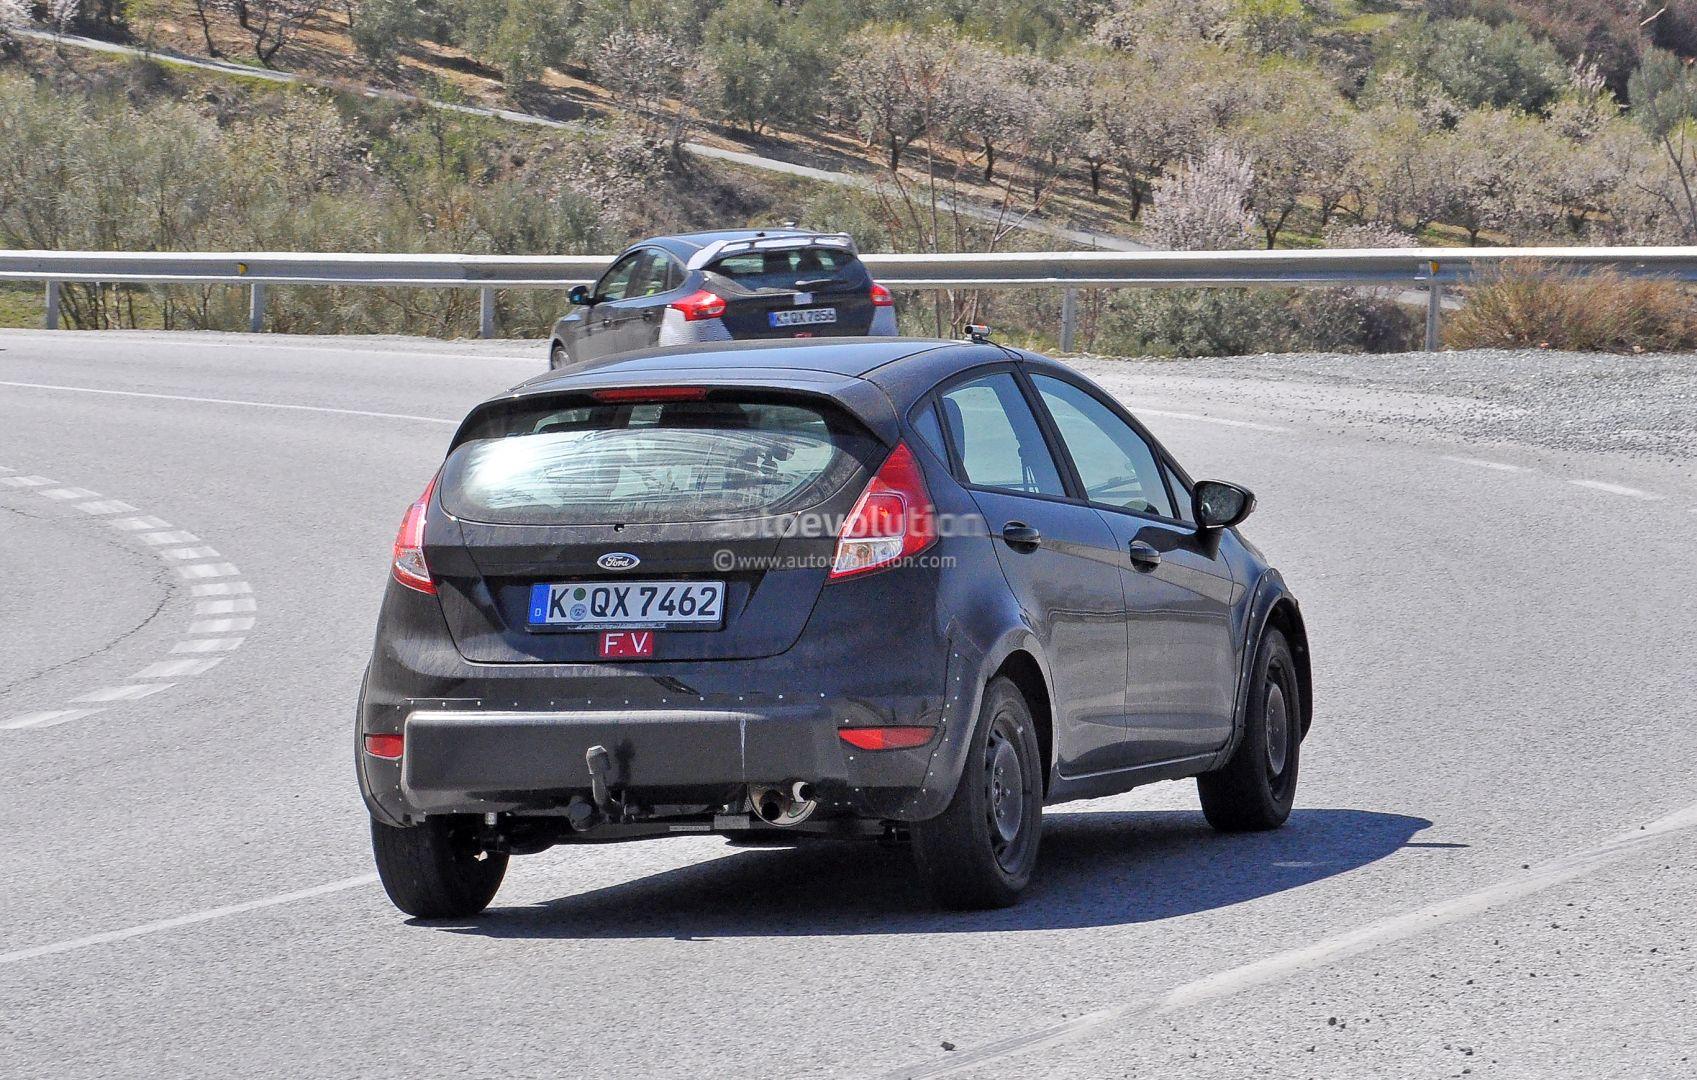 Ford Fiesta Rs Spyshots